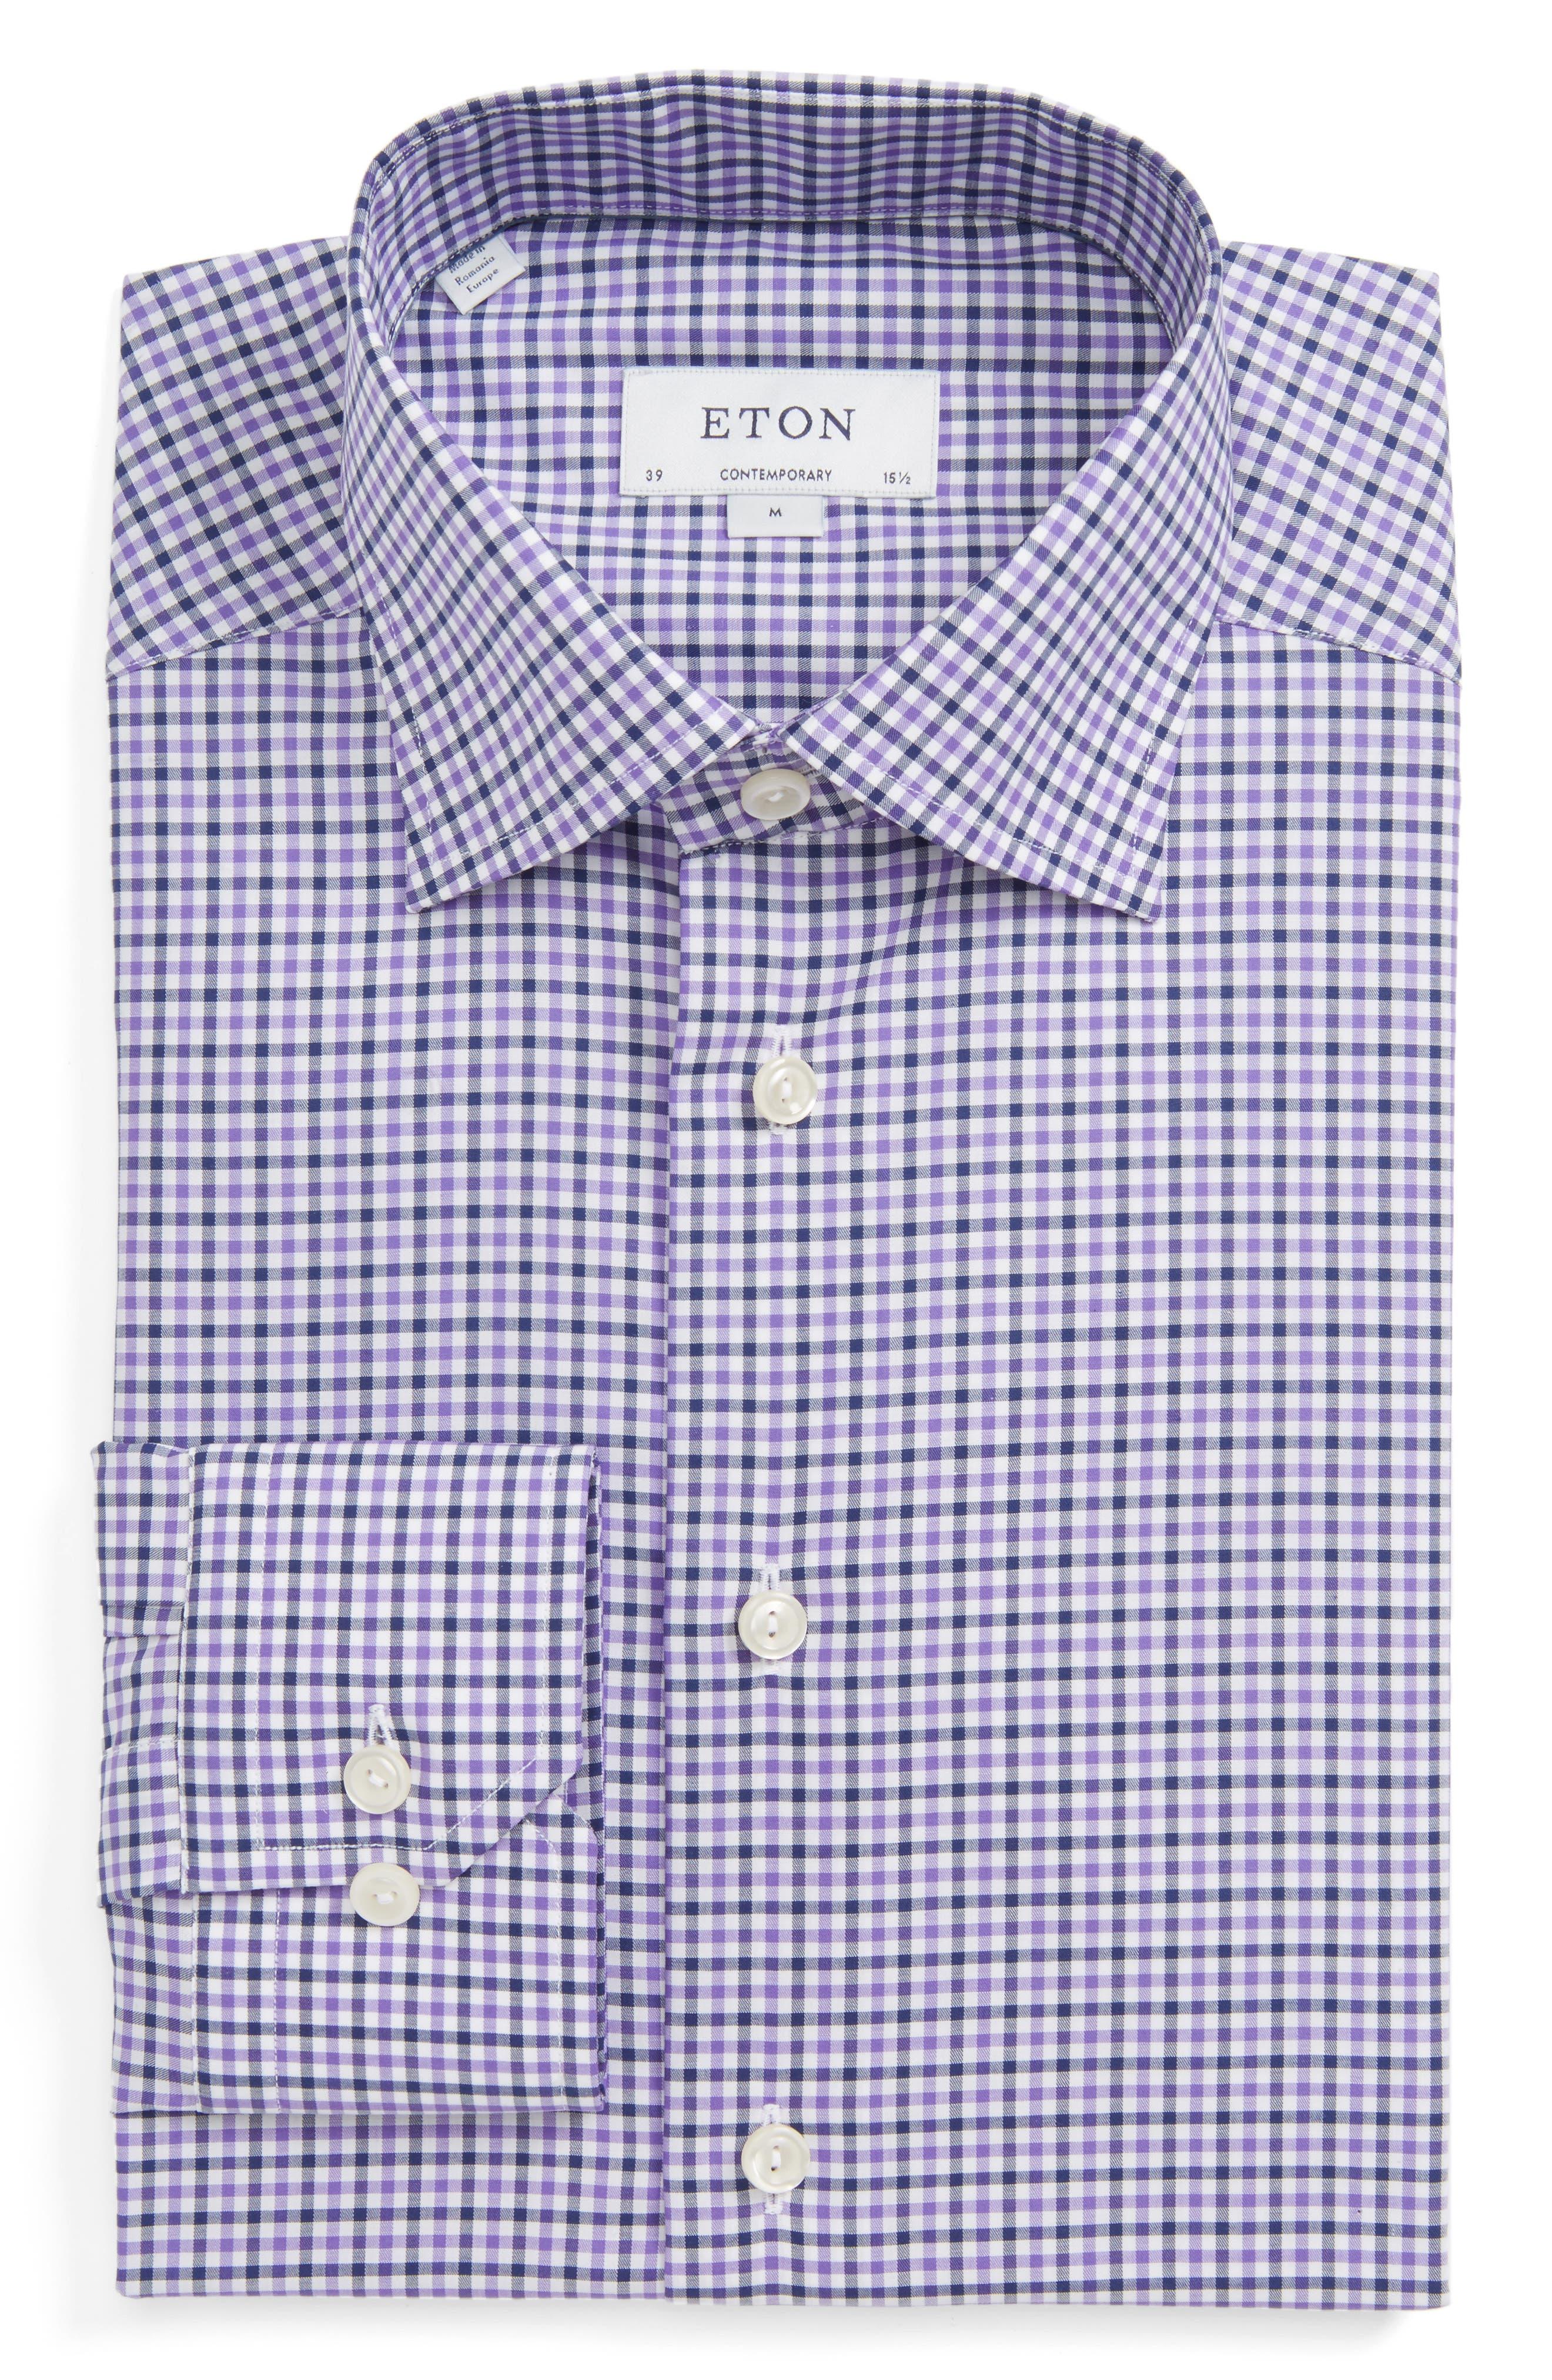 Contemporary Fit Check Dress Shirt,                         Main,                         color, 500